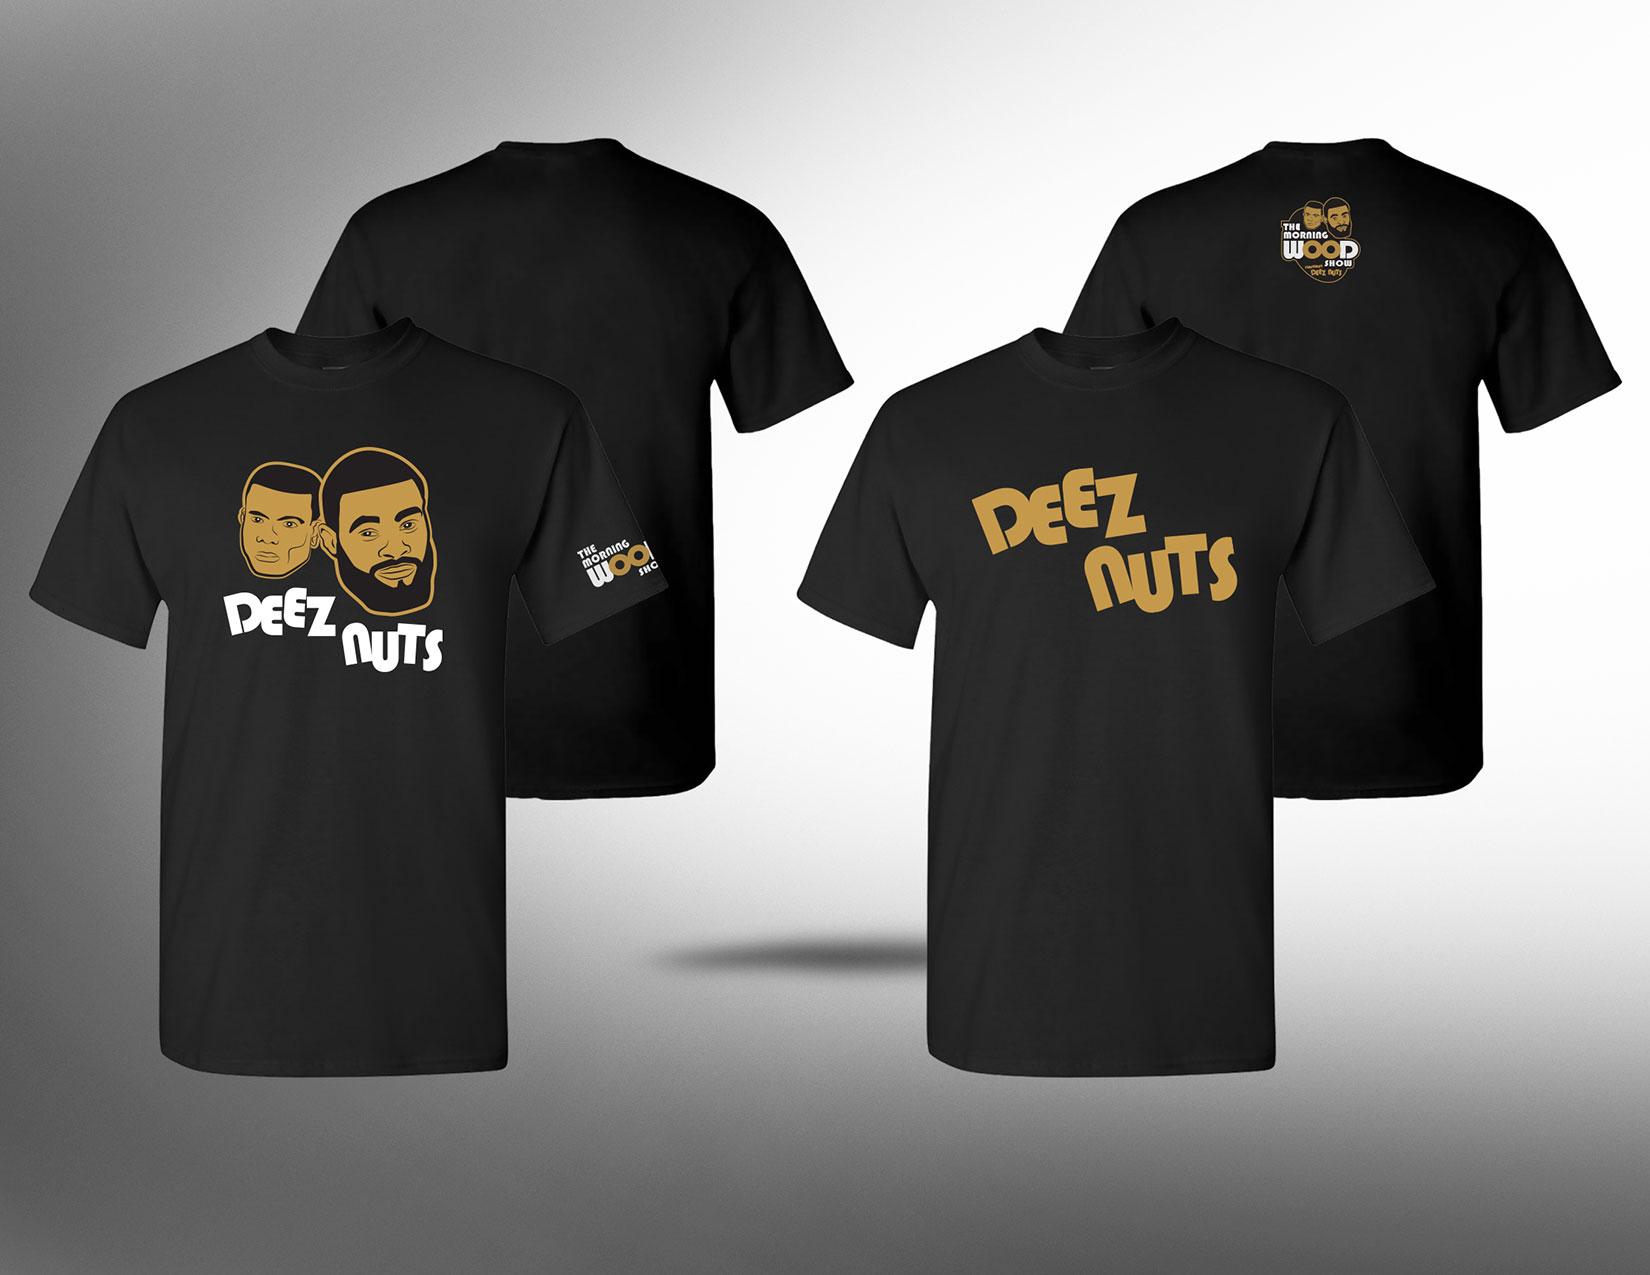 tee-shirt-designers-st-louis